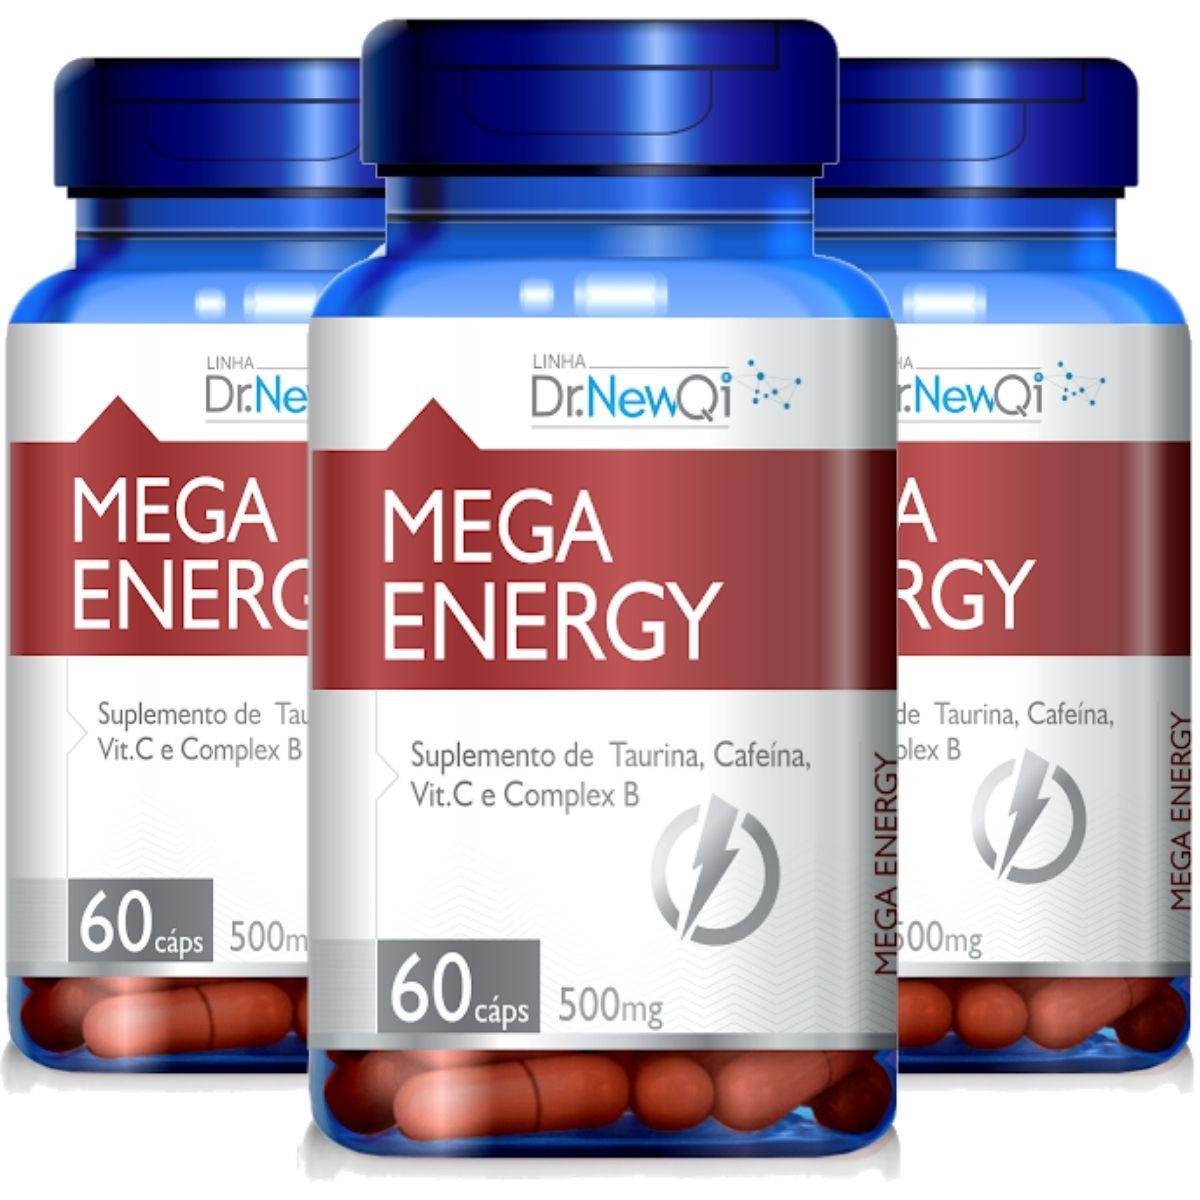 Kit 3 Mega Energy Taurina + Cafeína + Vit. C e Complexo B 60 Cápsulas - Upnutri